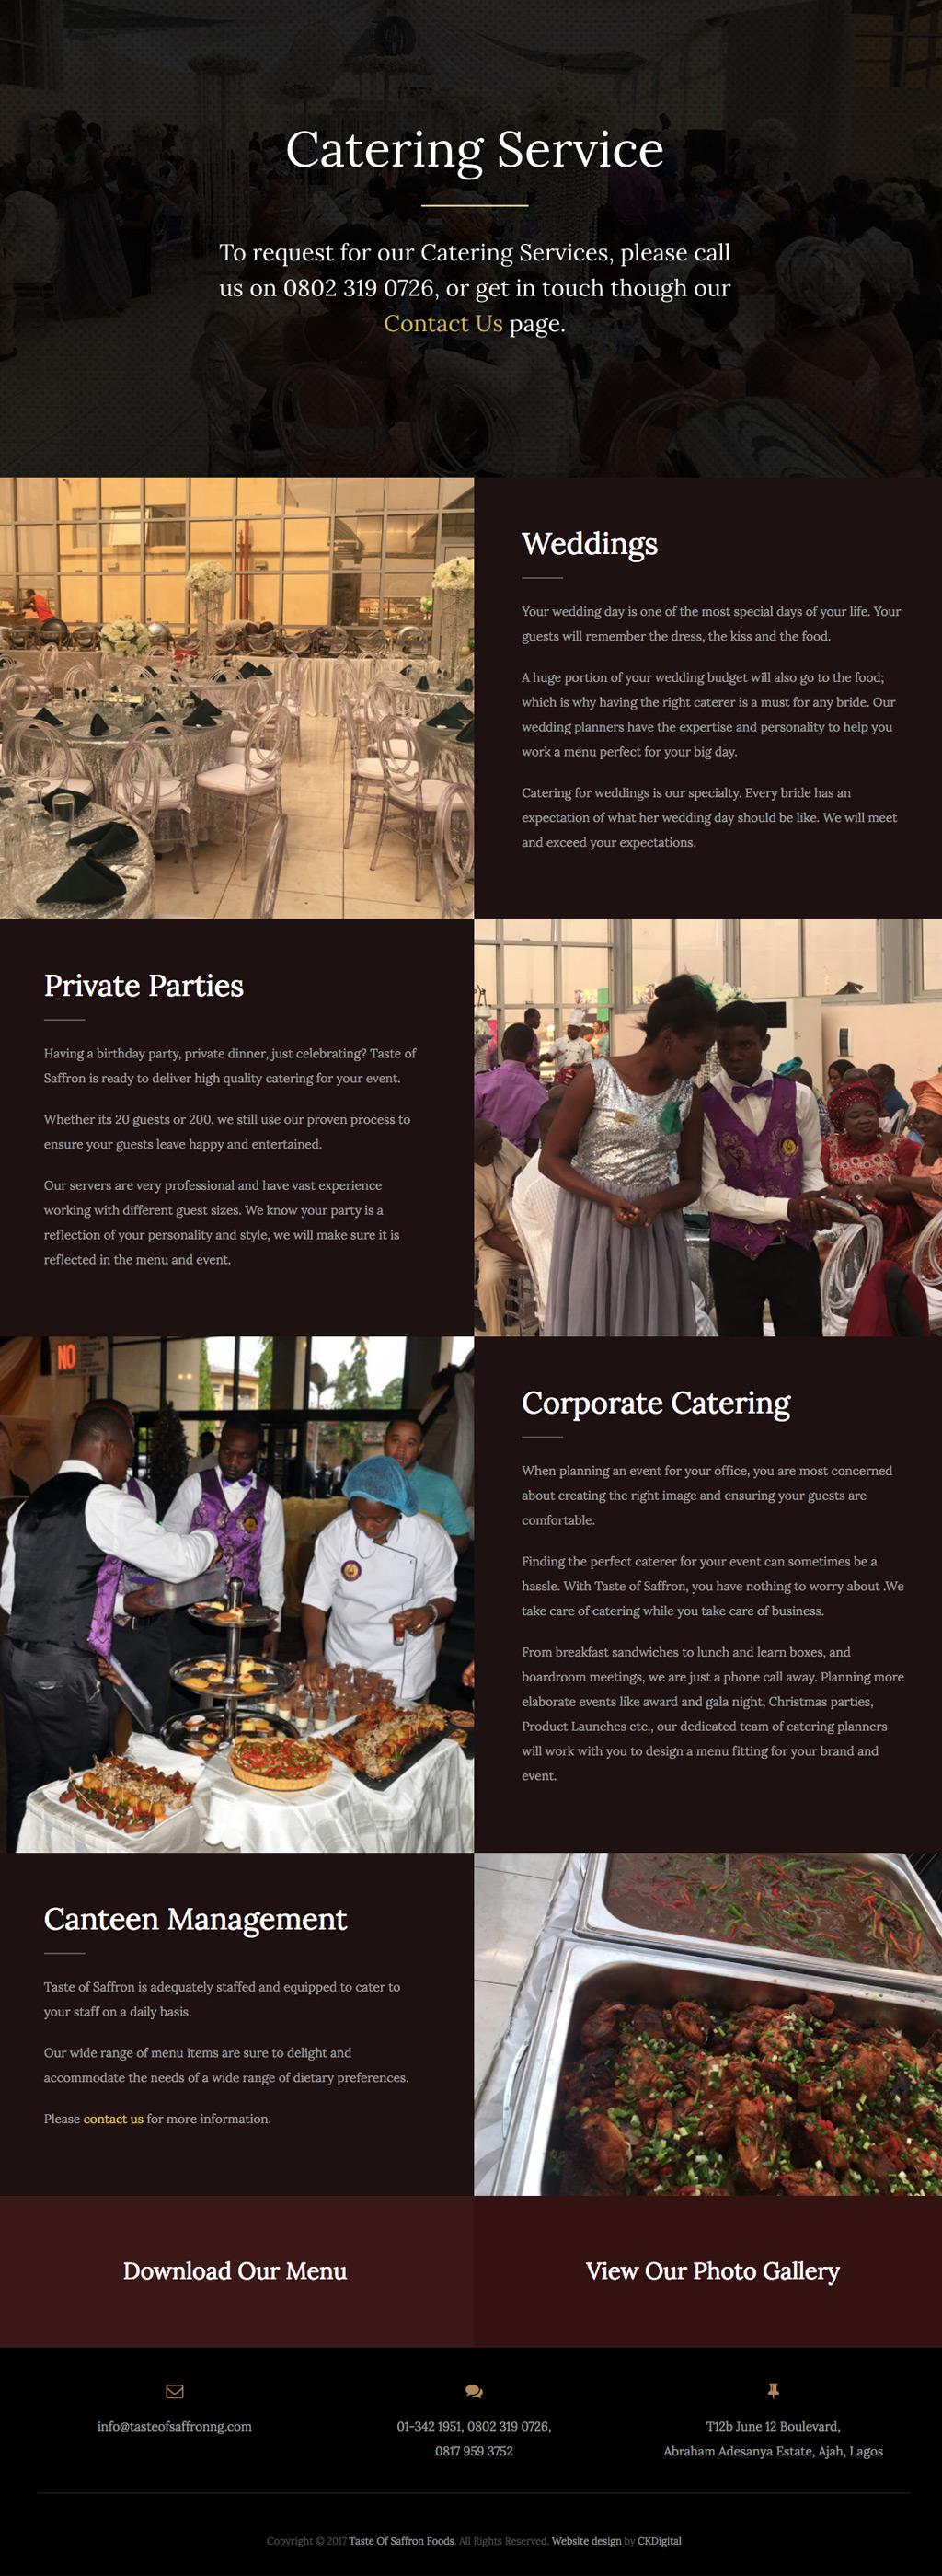 Taste of Saffron Website - Service Page Design